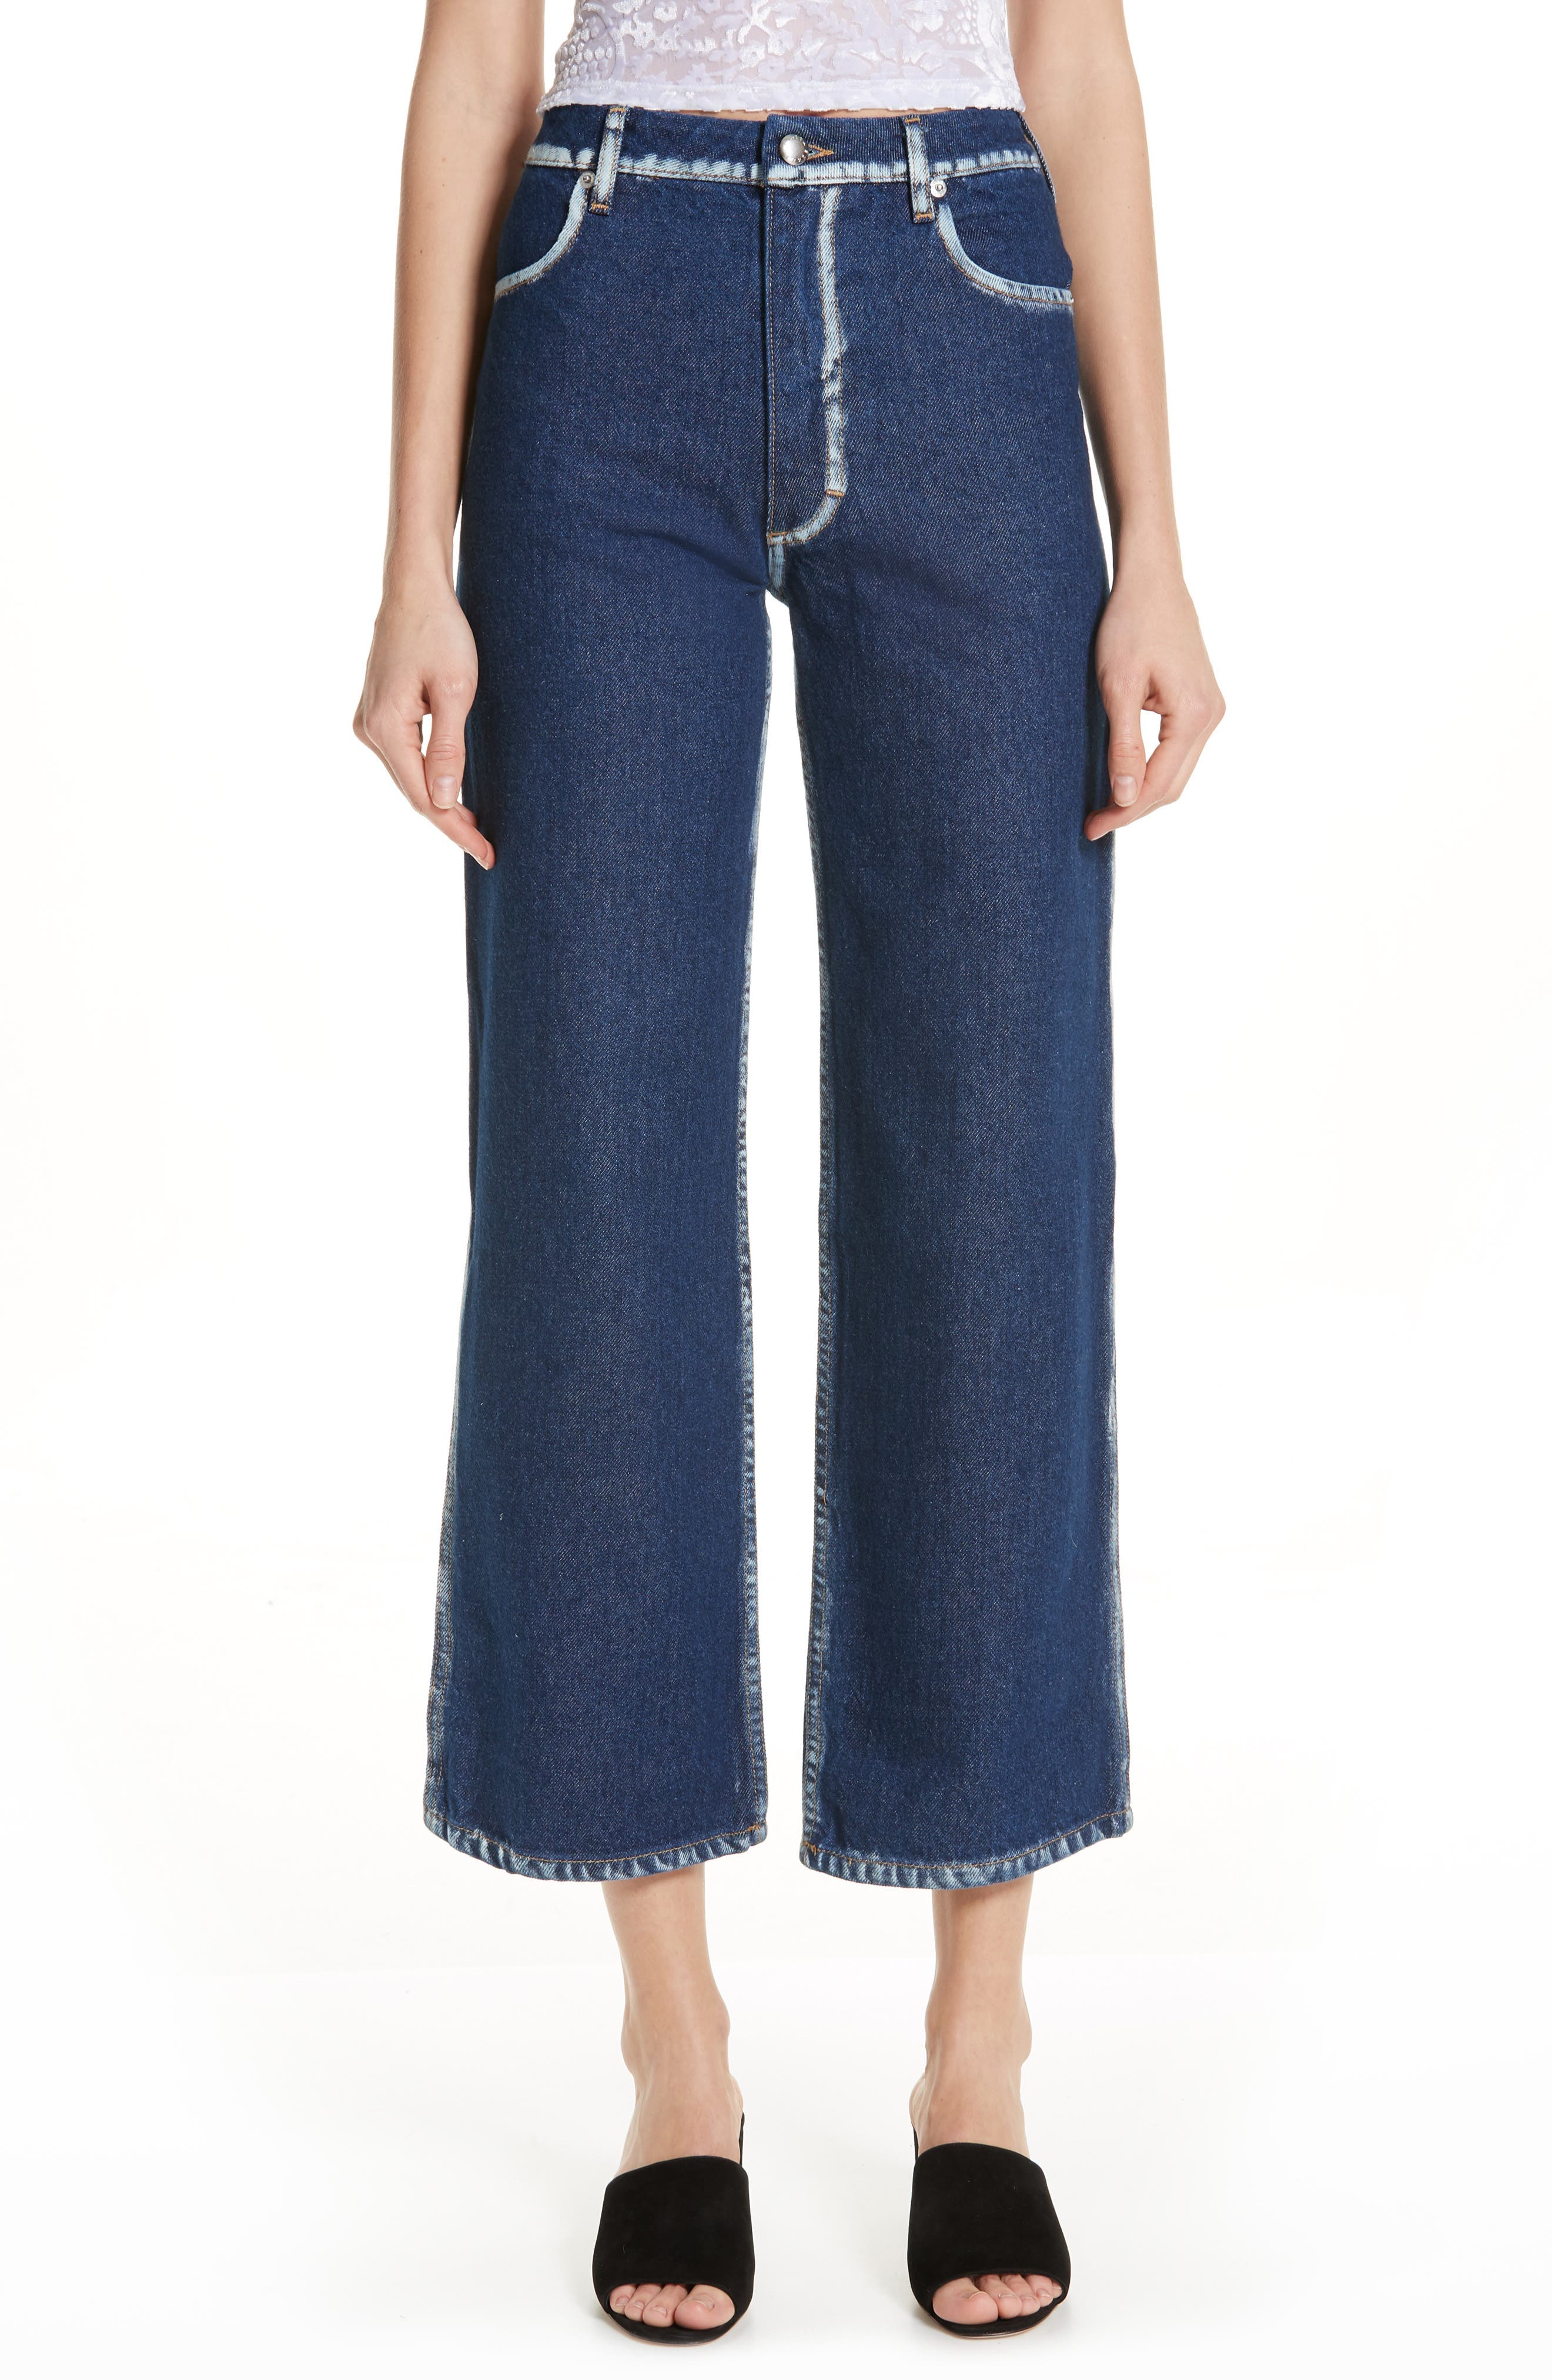 EL Painted Seam Wide Leg Jeans,                         Main,                         color, BLUE SEAM PAINTING